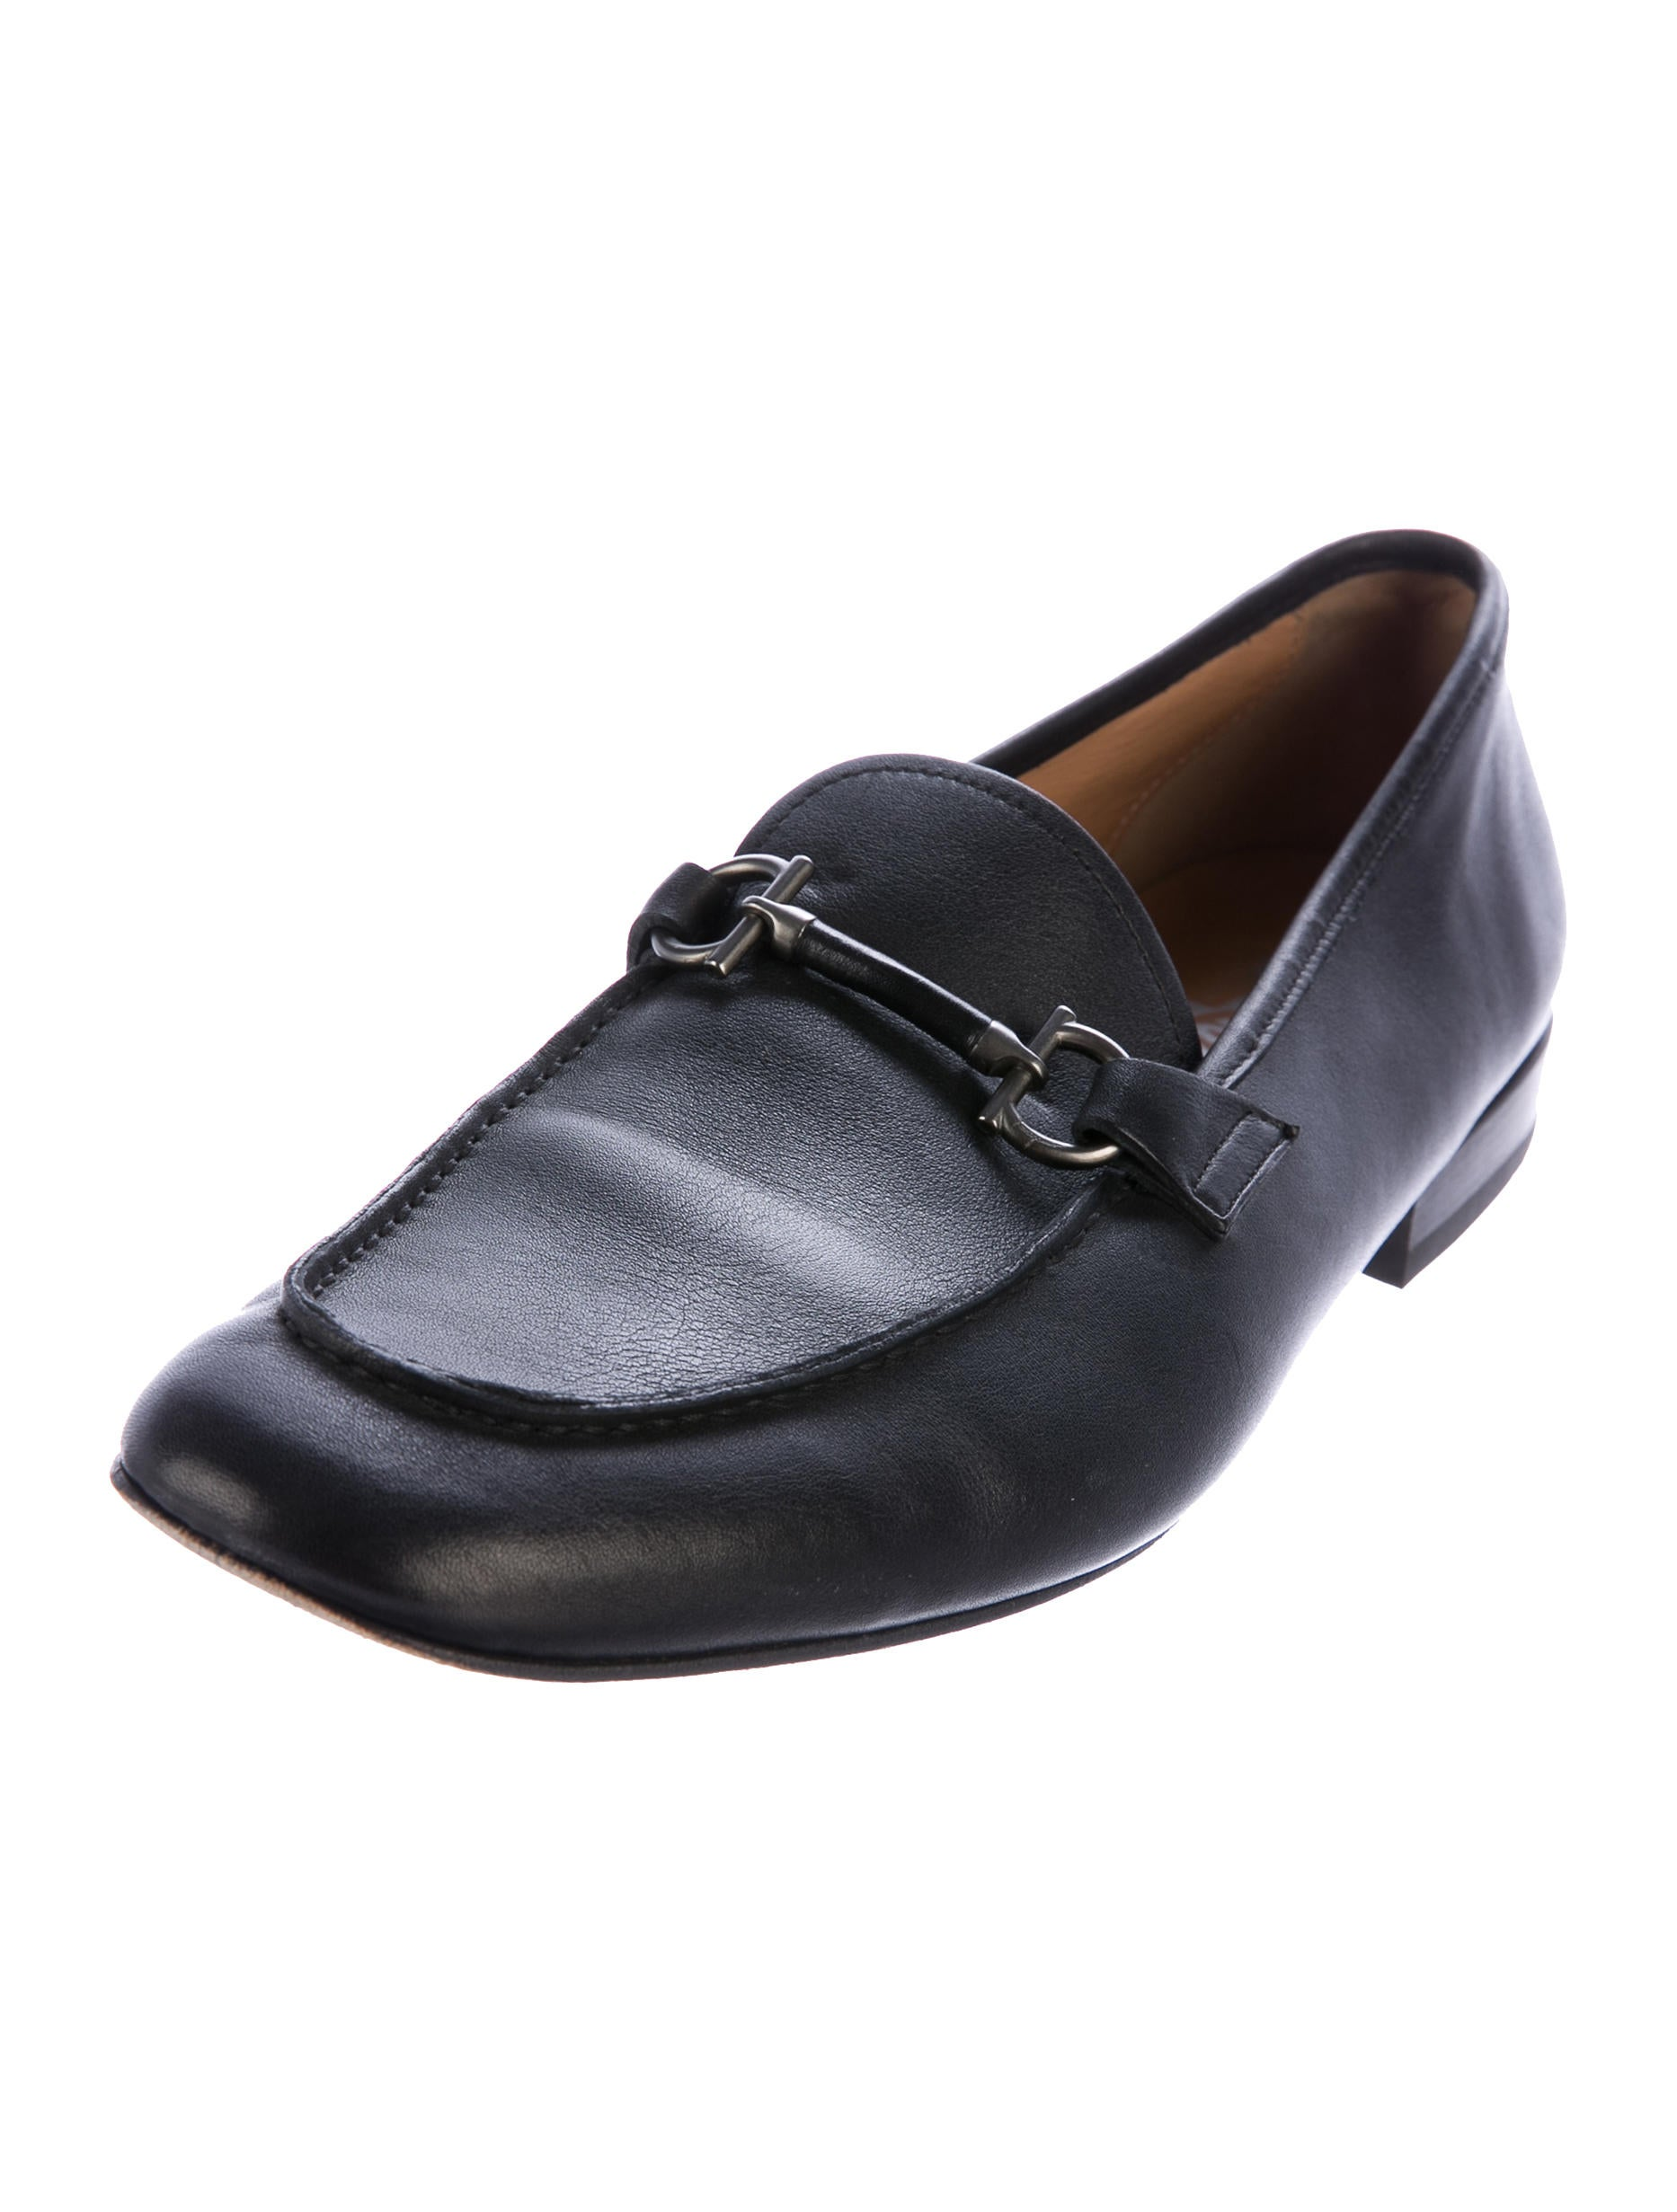 salvatore ferragamo gancini dress loafers shoes